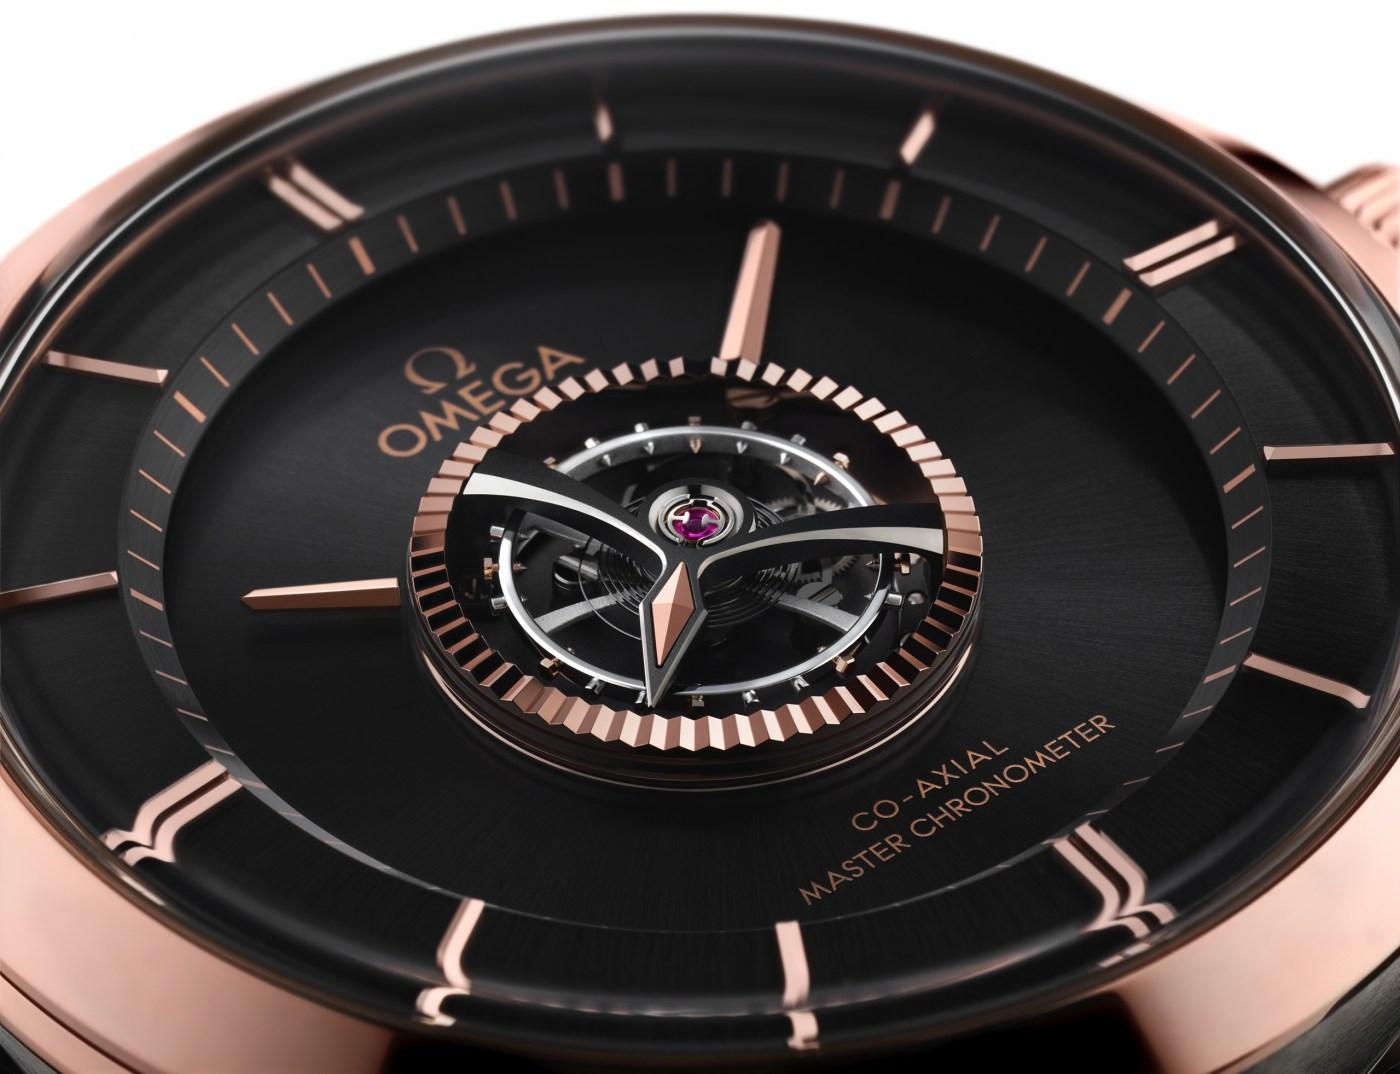 Omega De Ville Tourbillon Master Chronometer Numbered Edition dial close-up